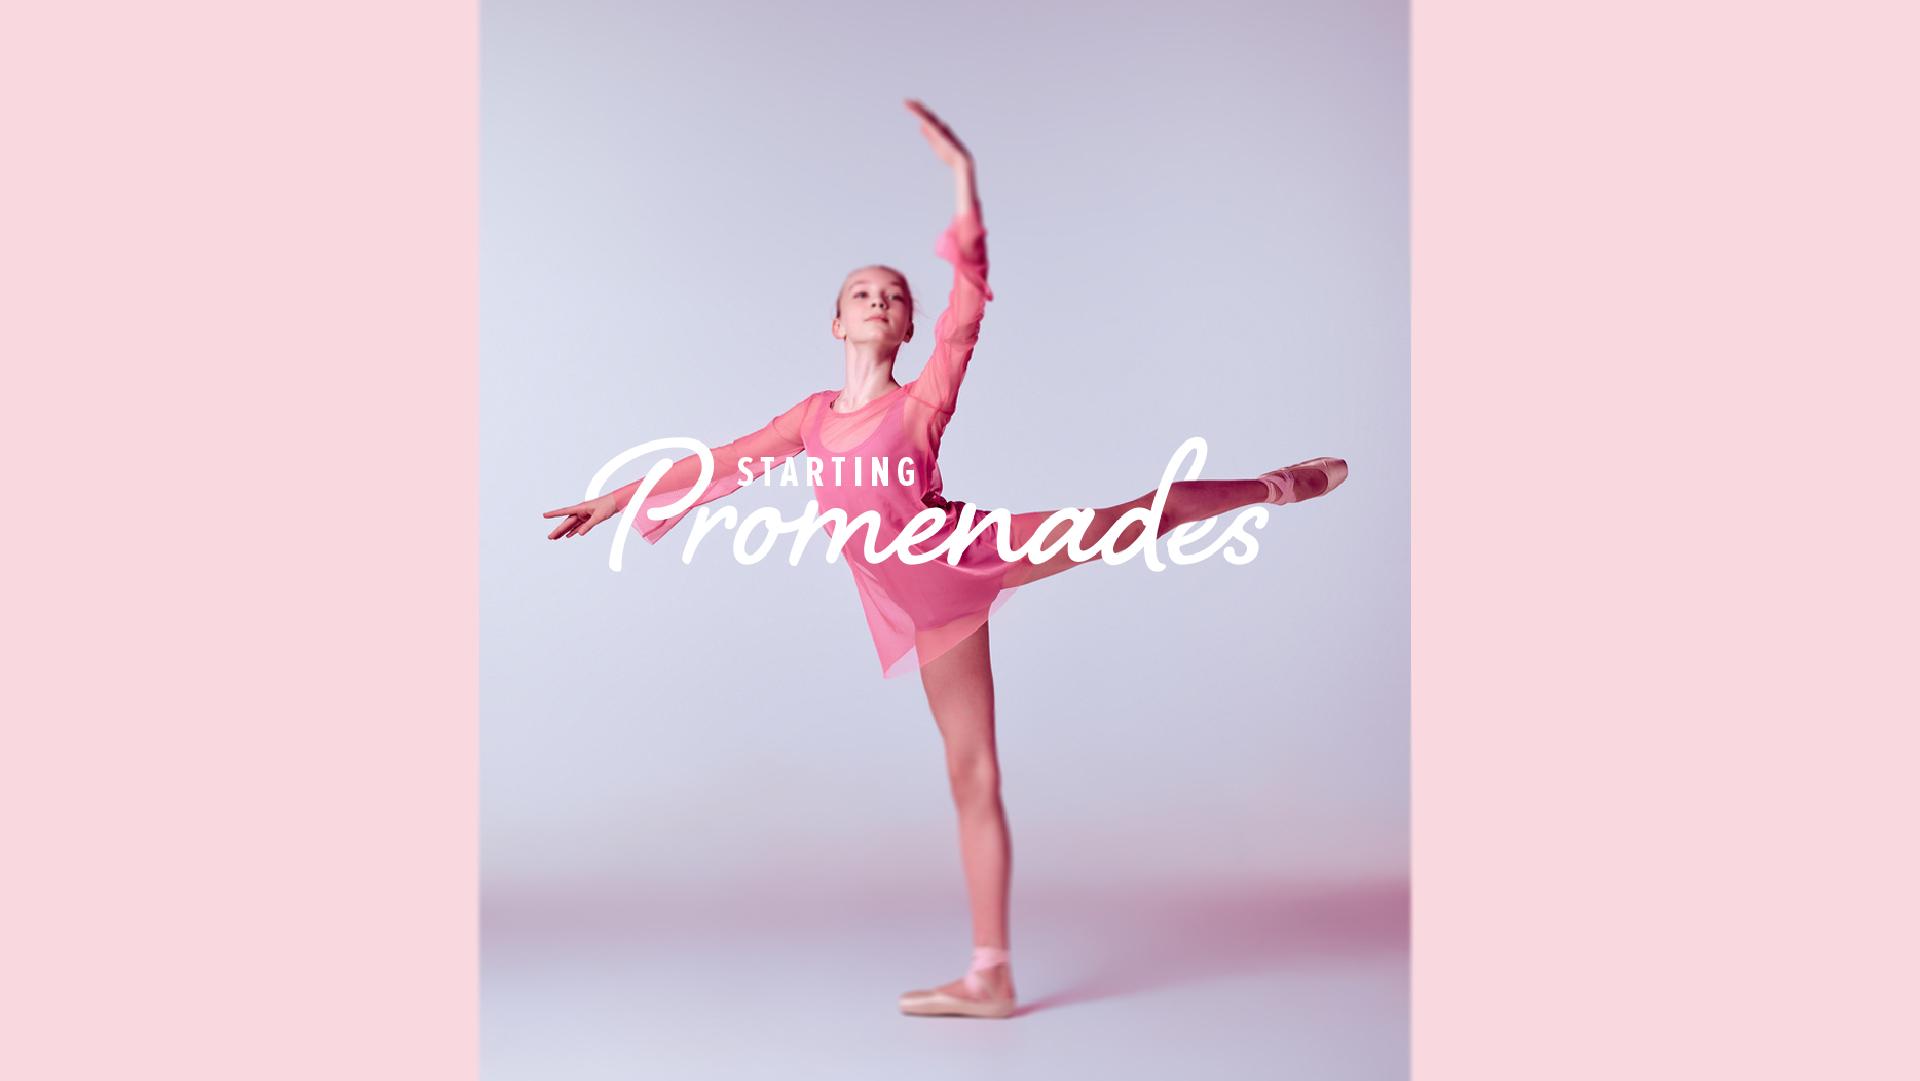 Starting Promenades